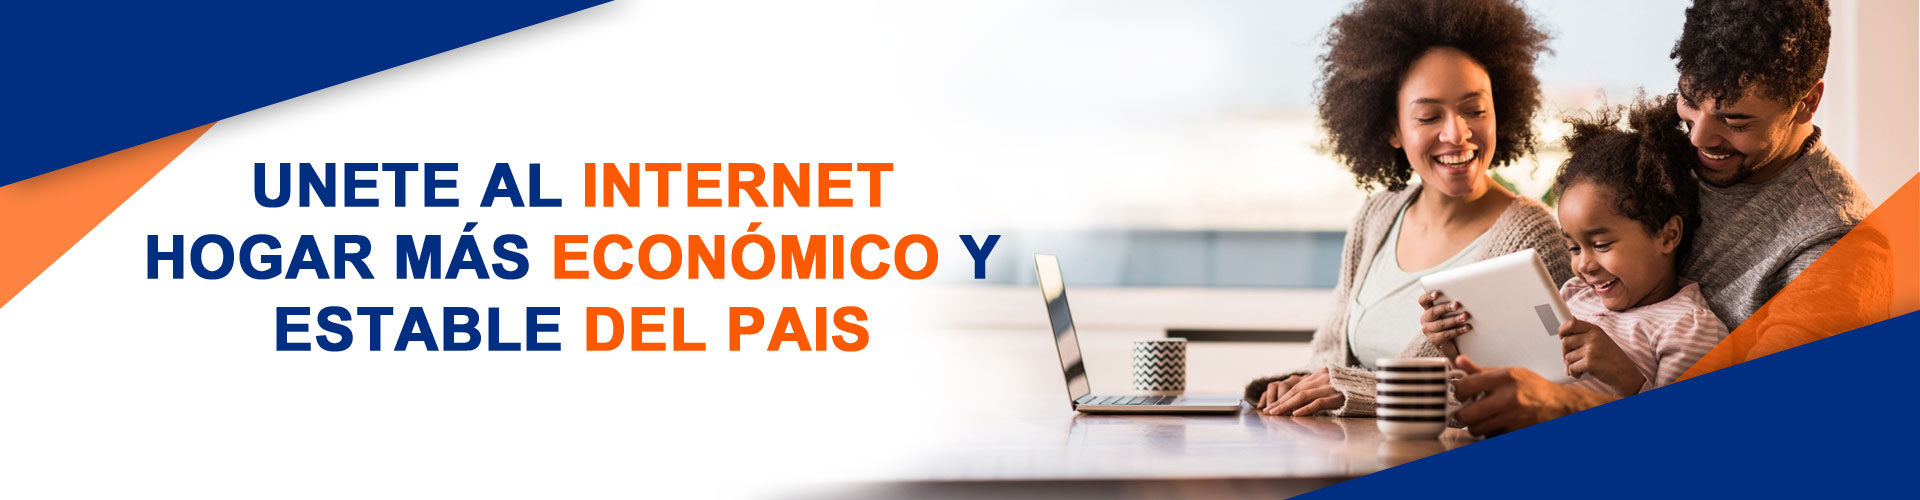 Internet Hogar Económico